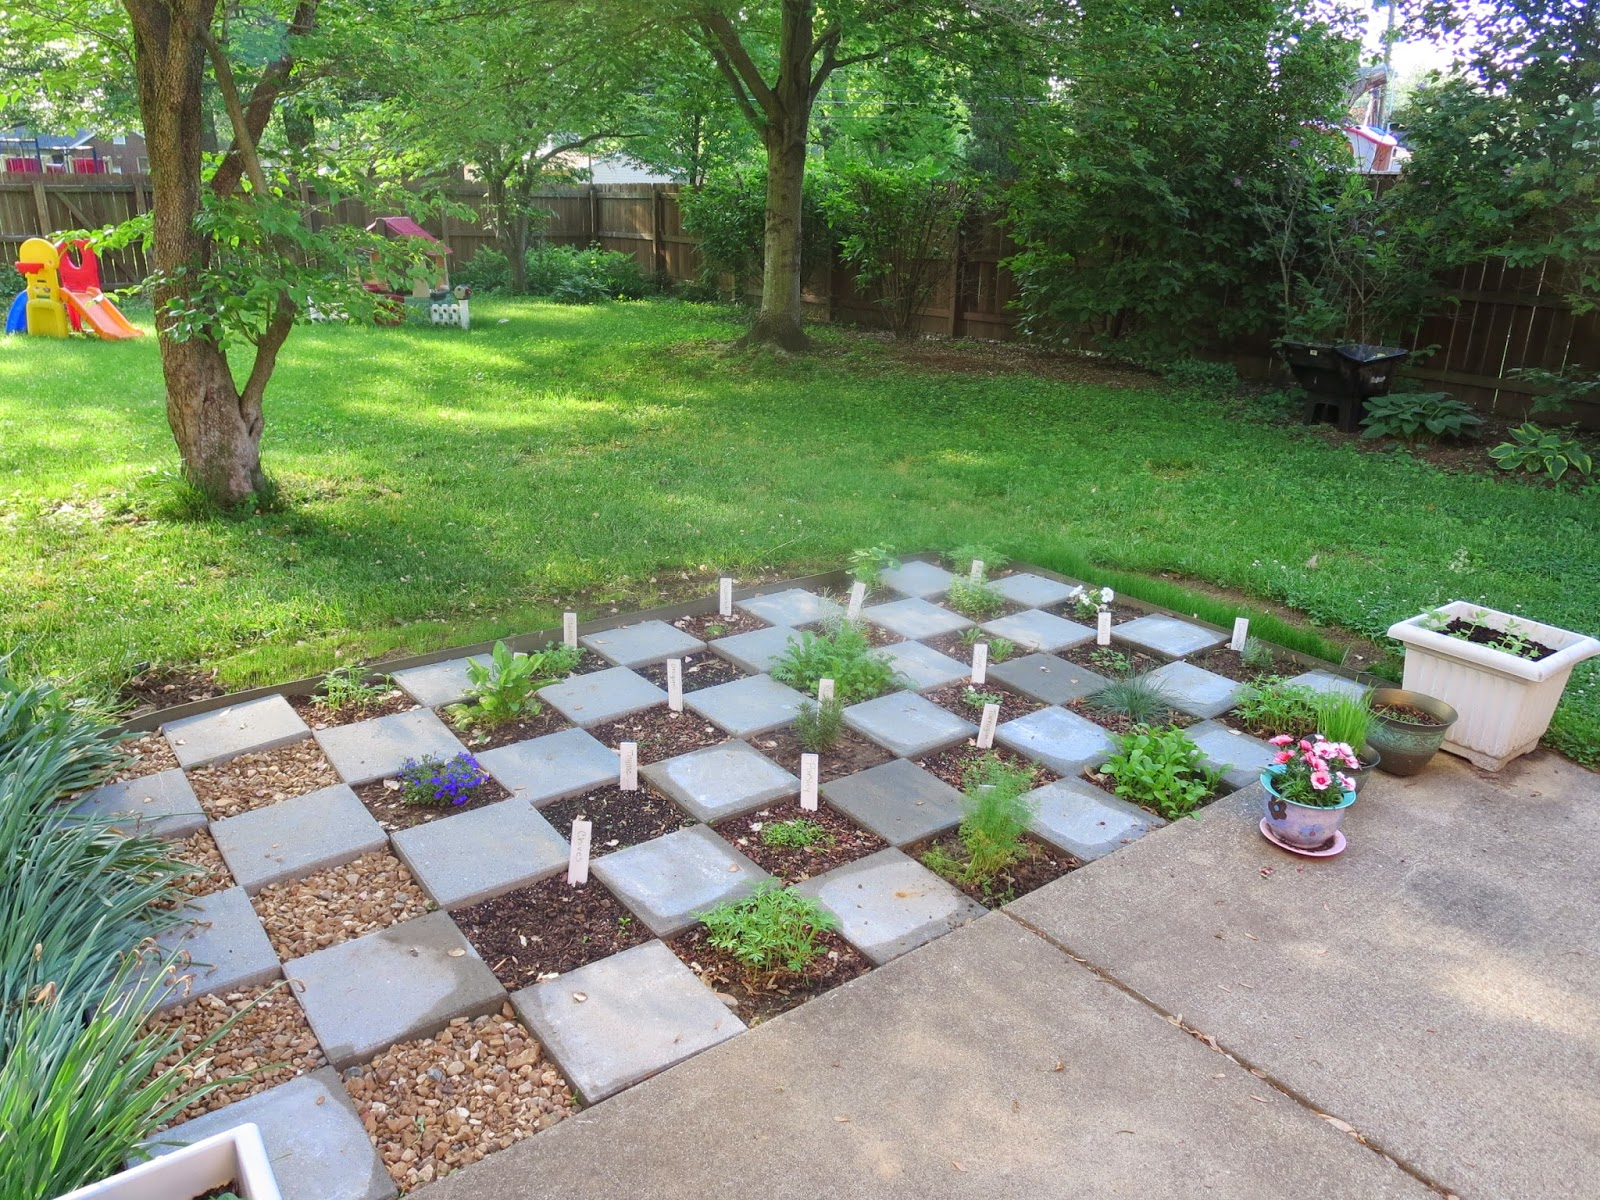 Checkerboard herb garden back home again checkerboard for Checkerboard garden designs